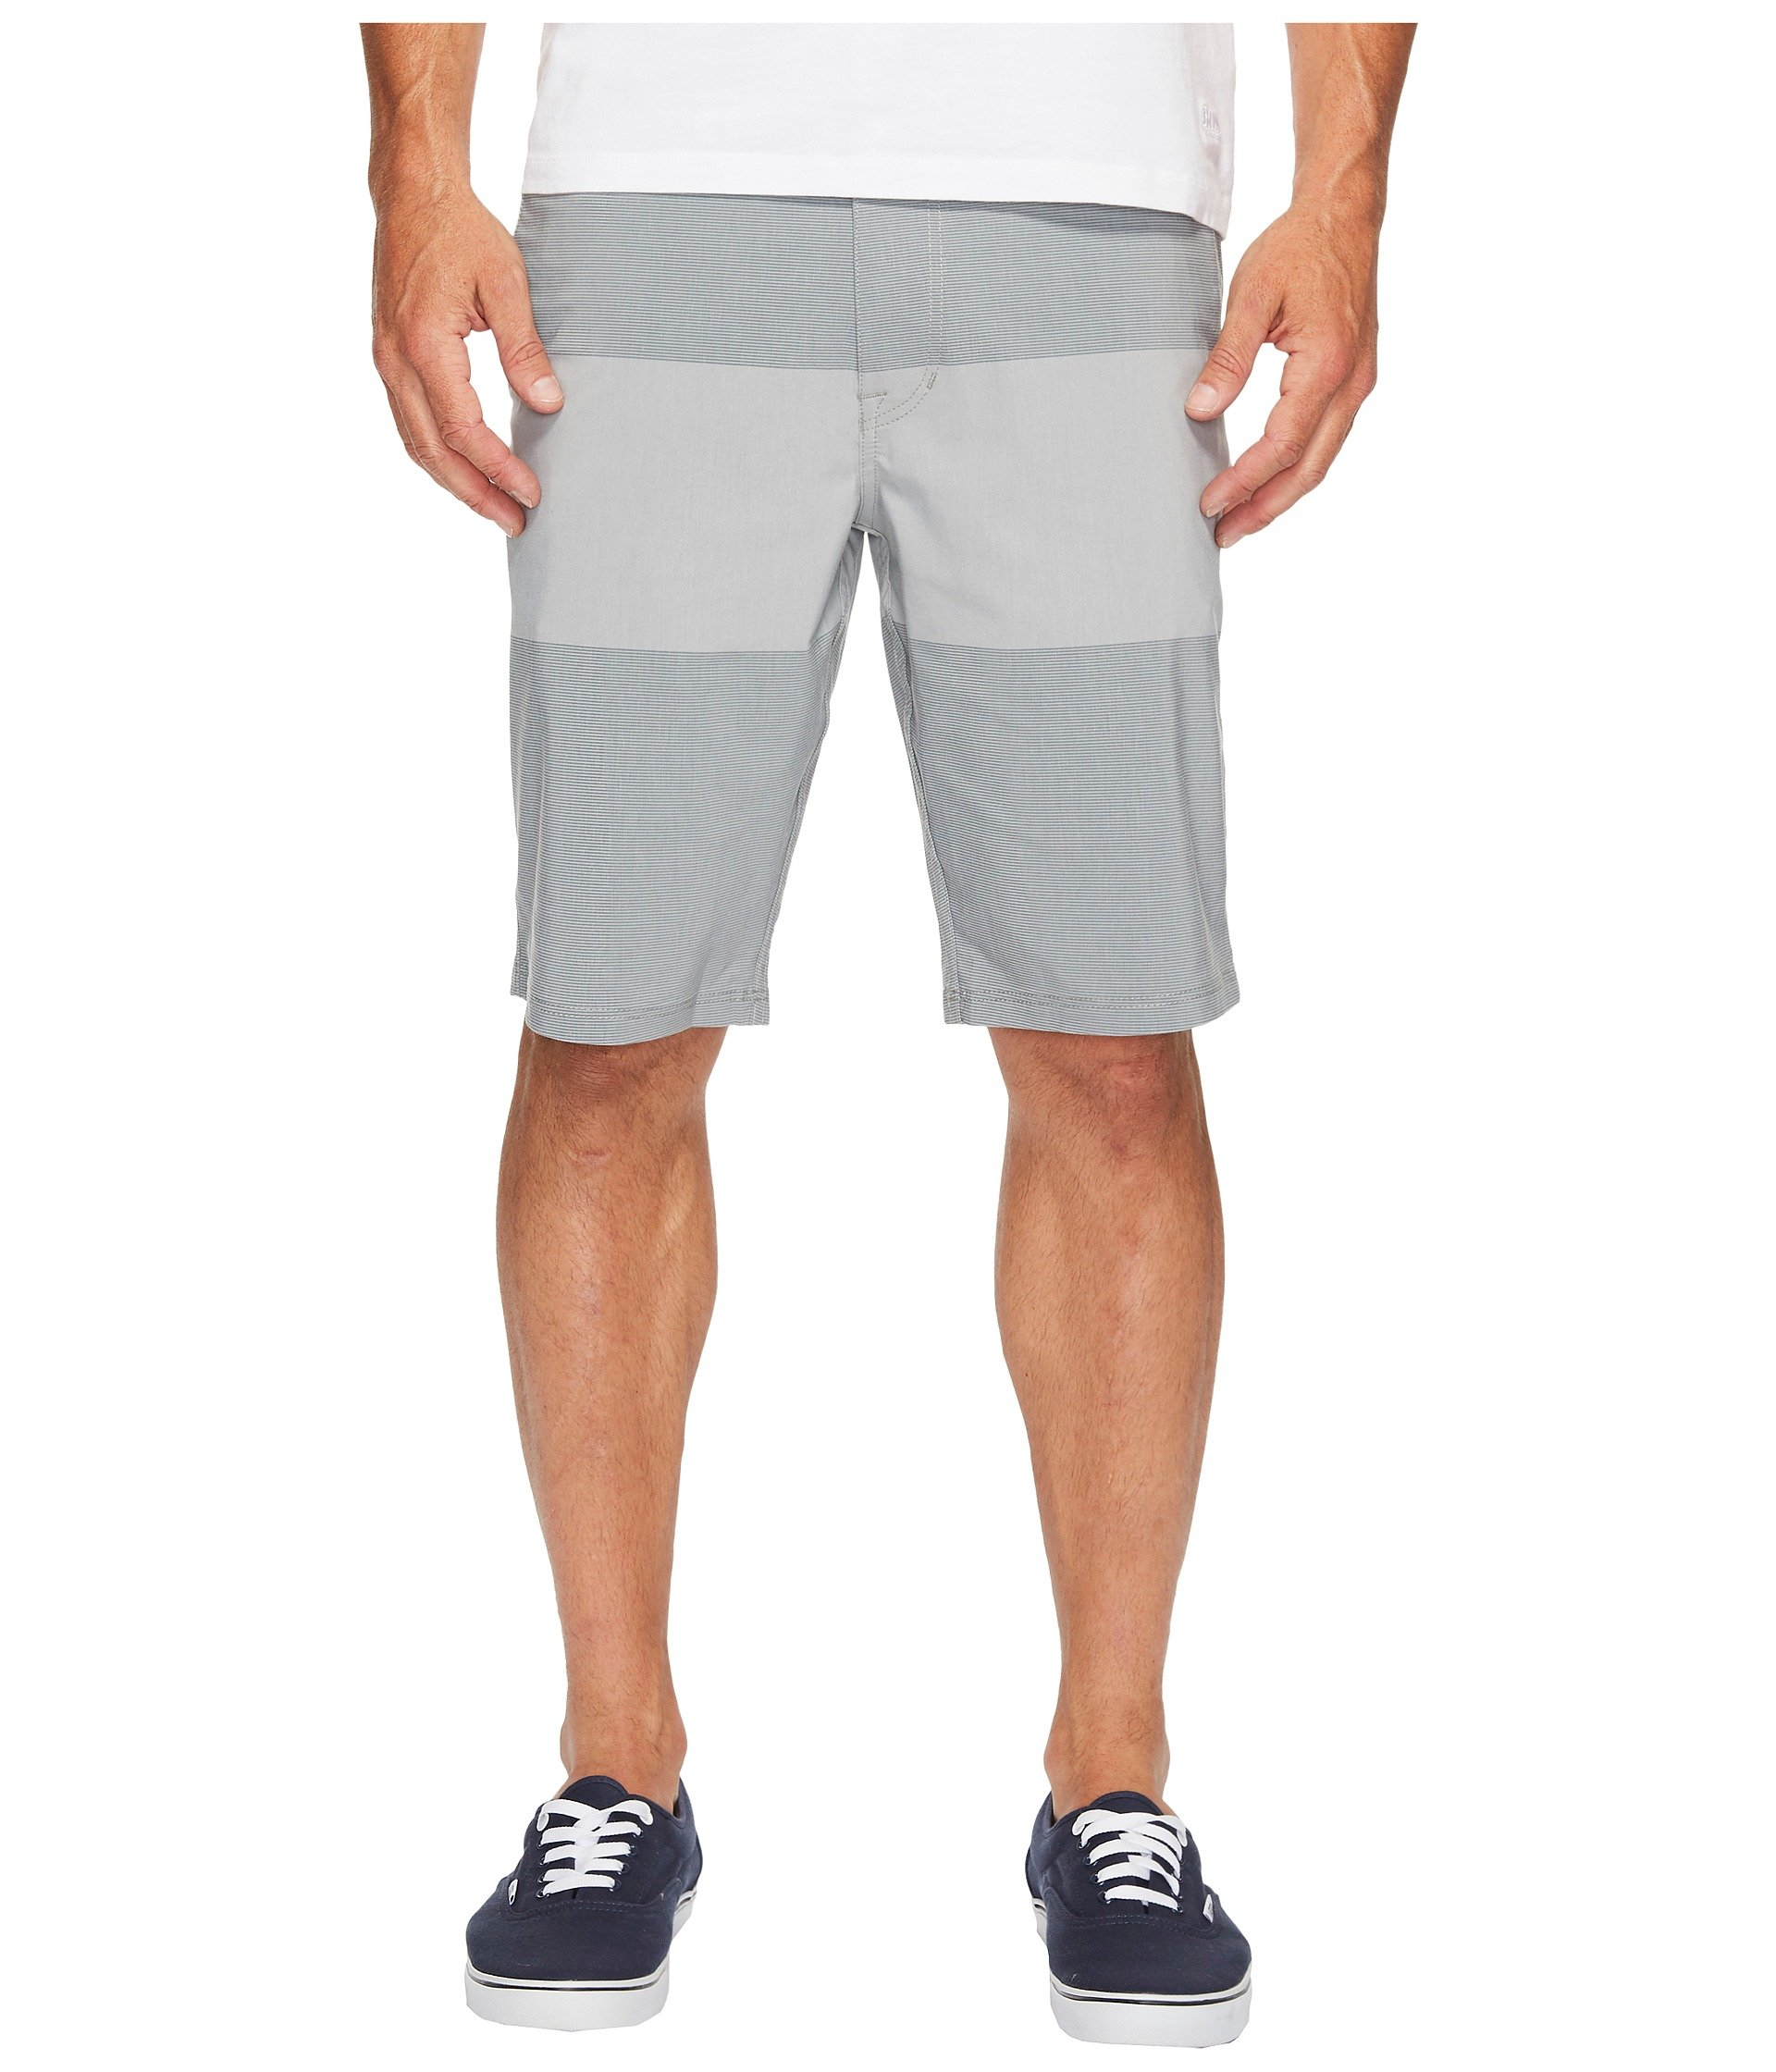 "Pantaloneta para Hombre Volcom SNT Frickin Mix 21"" Shorts  + Volcom en VeoyCompro.net"